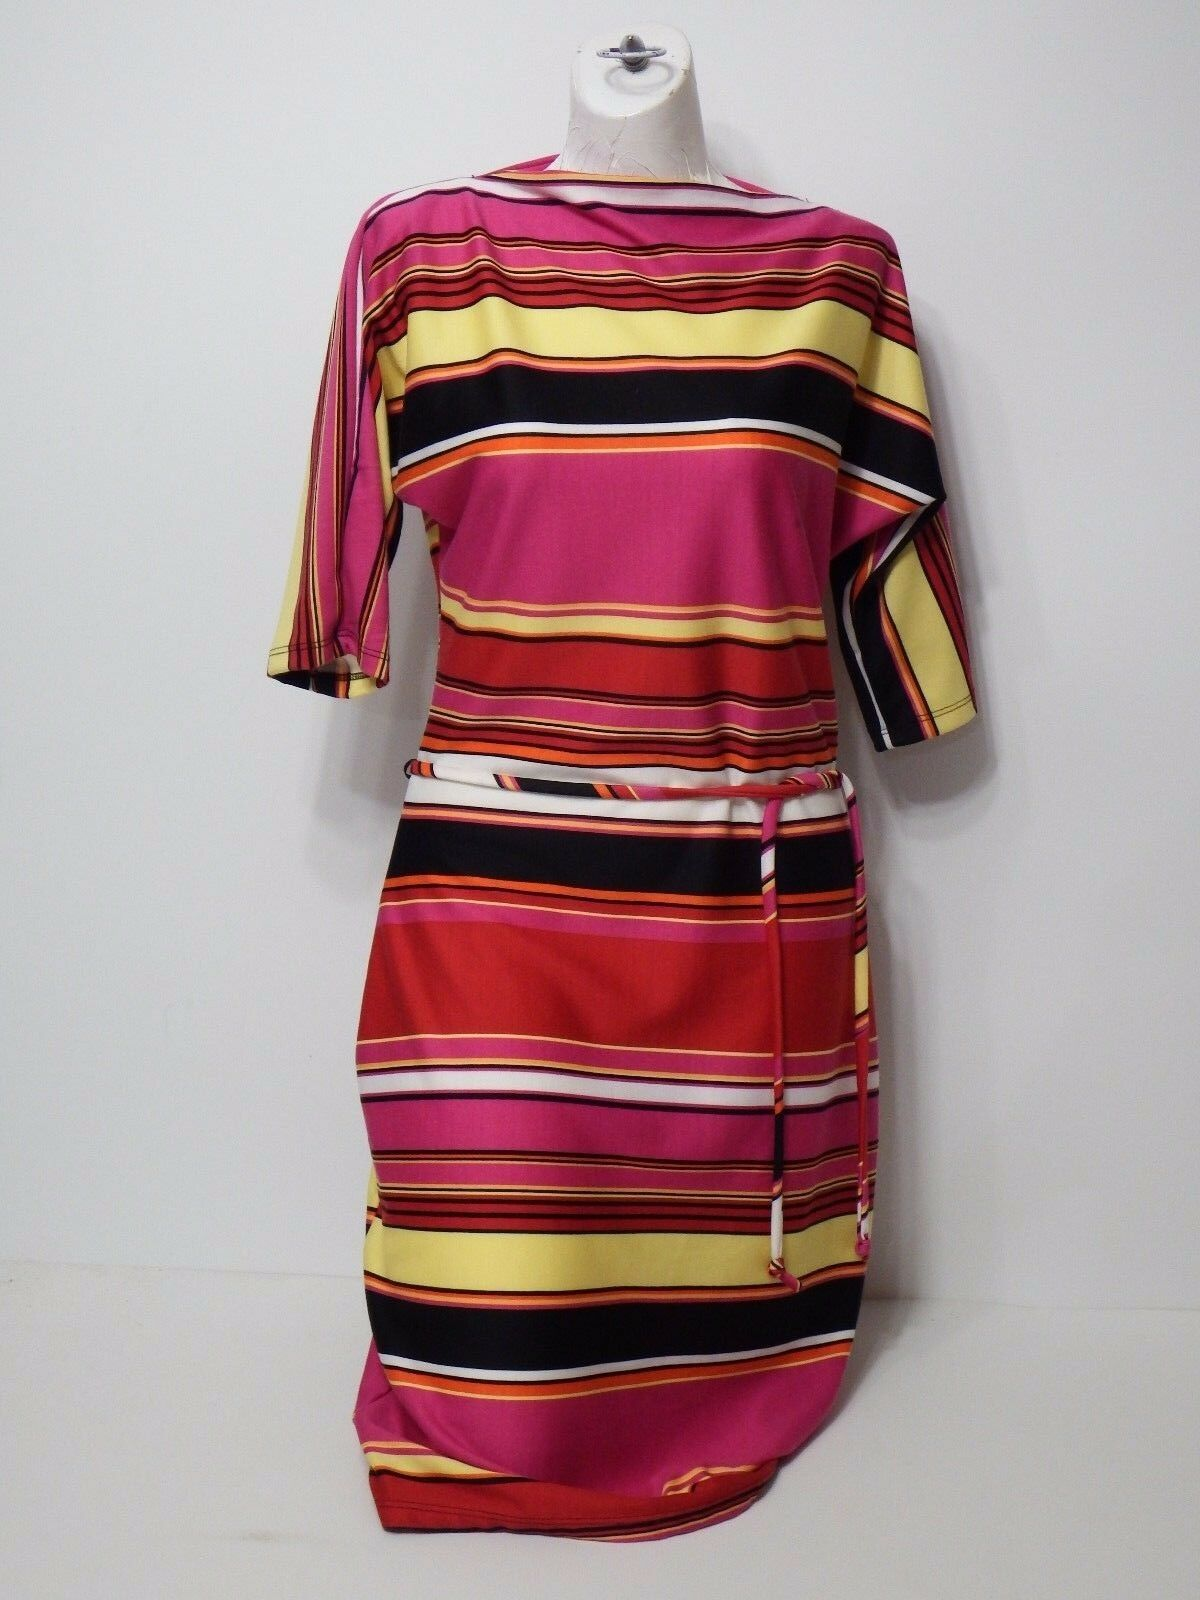 Woman Dress Olivia Matthews Size 10 3 4 Sleeves Pink Multi Wiggle Pencil Striped